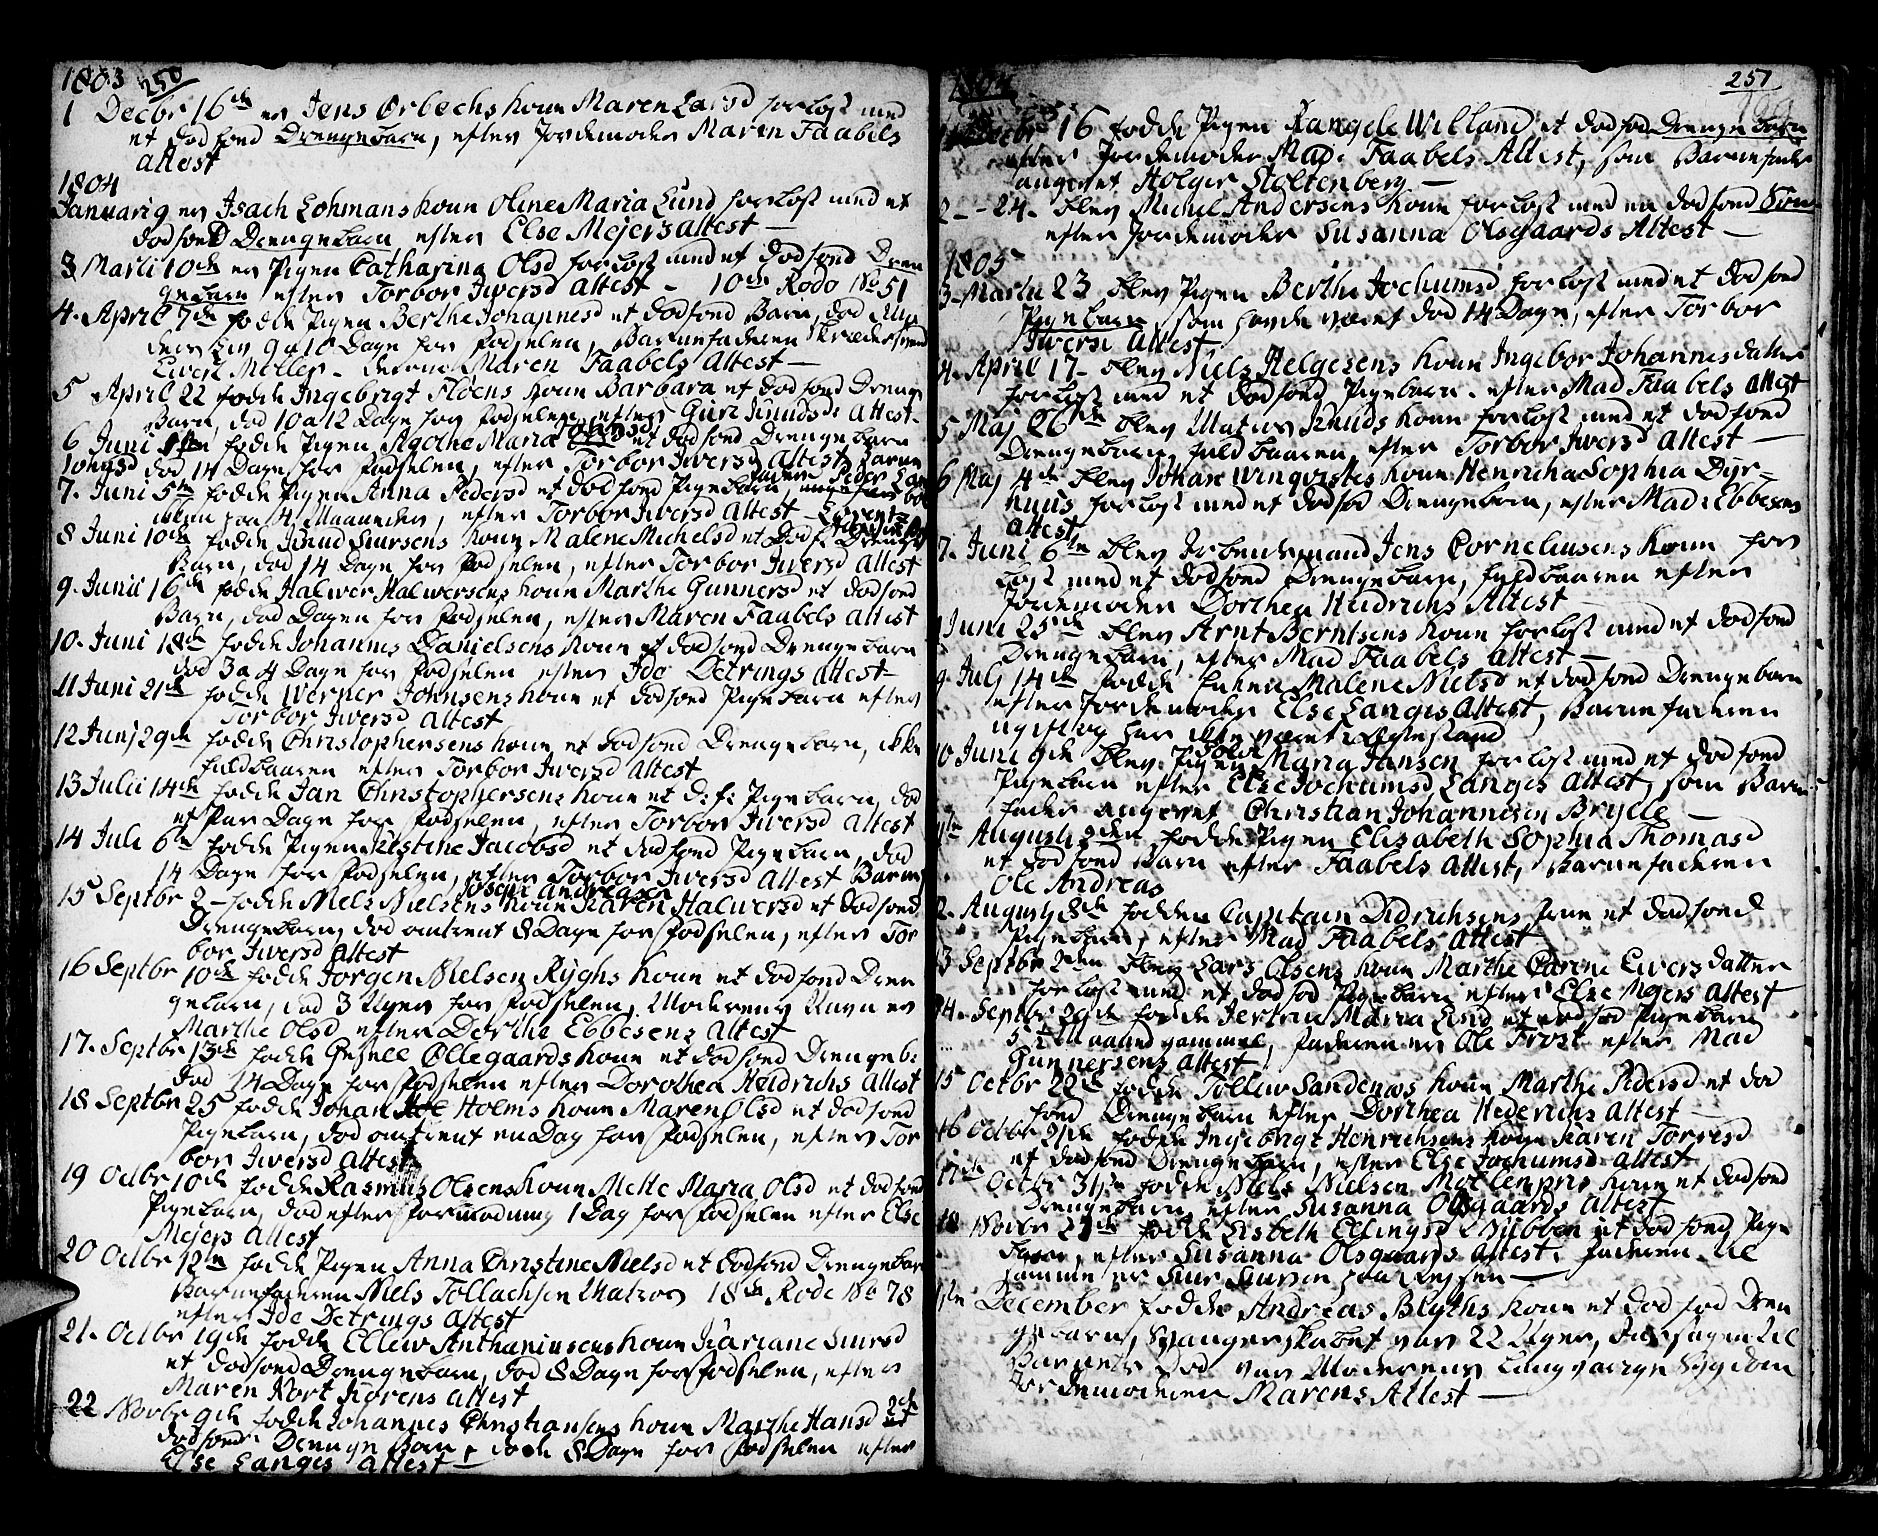 SAB, Domkirken Sokneprestembete, H/Haa/L0009: Ministerialbok nr. A 9, 1776-1821, s. 250-251